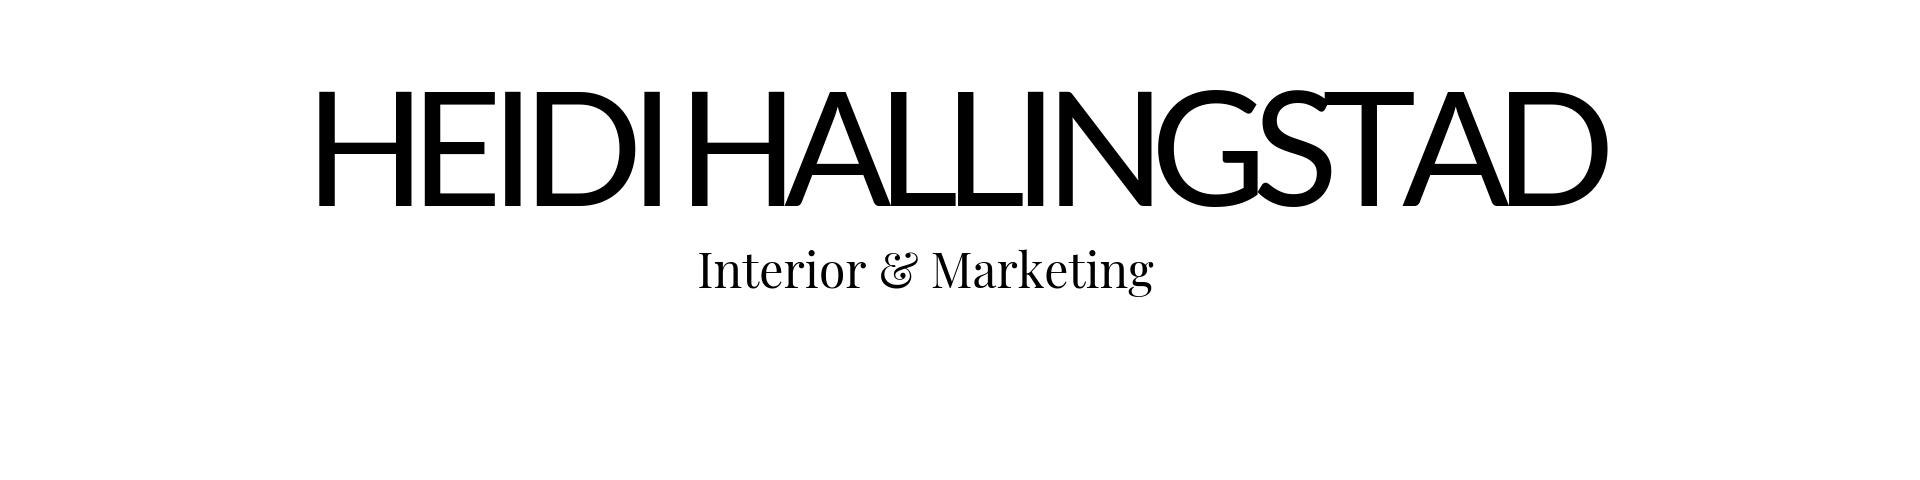 heidihallingstad.com